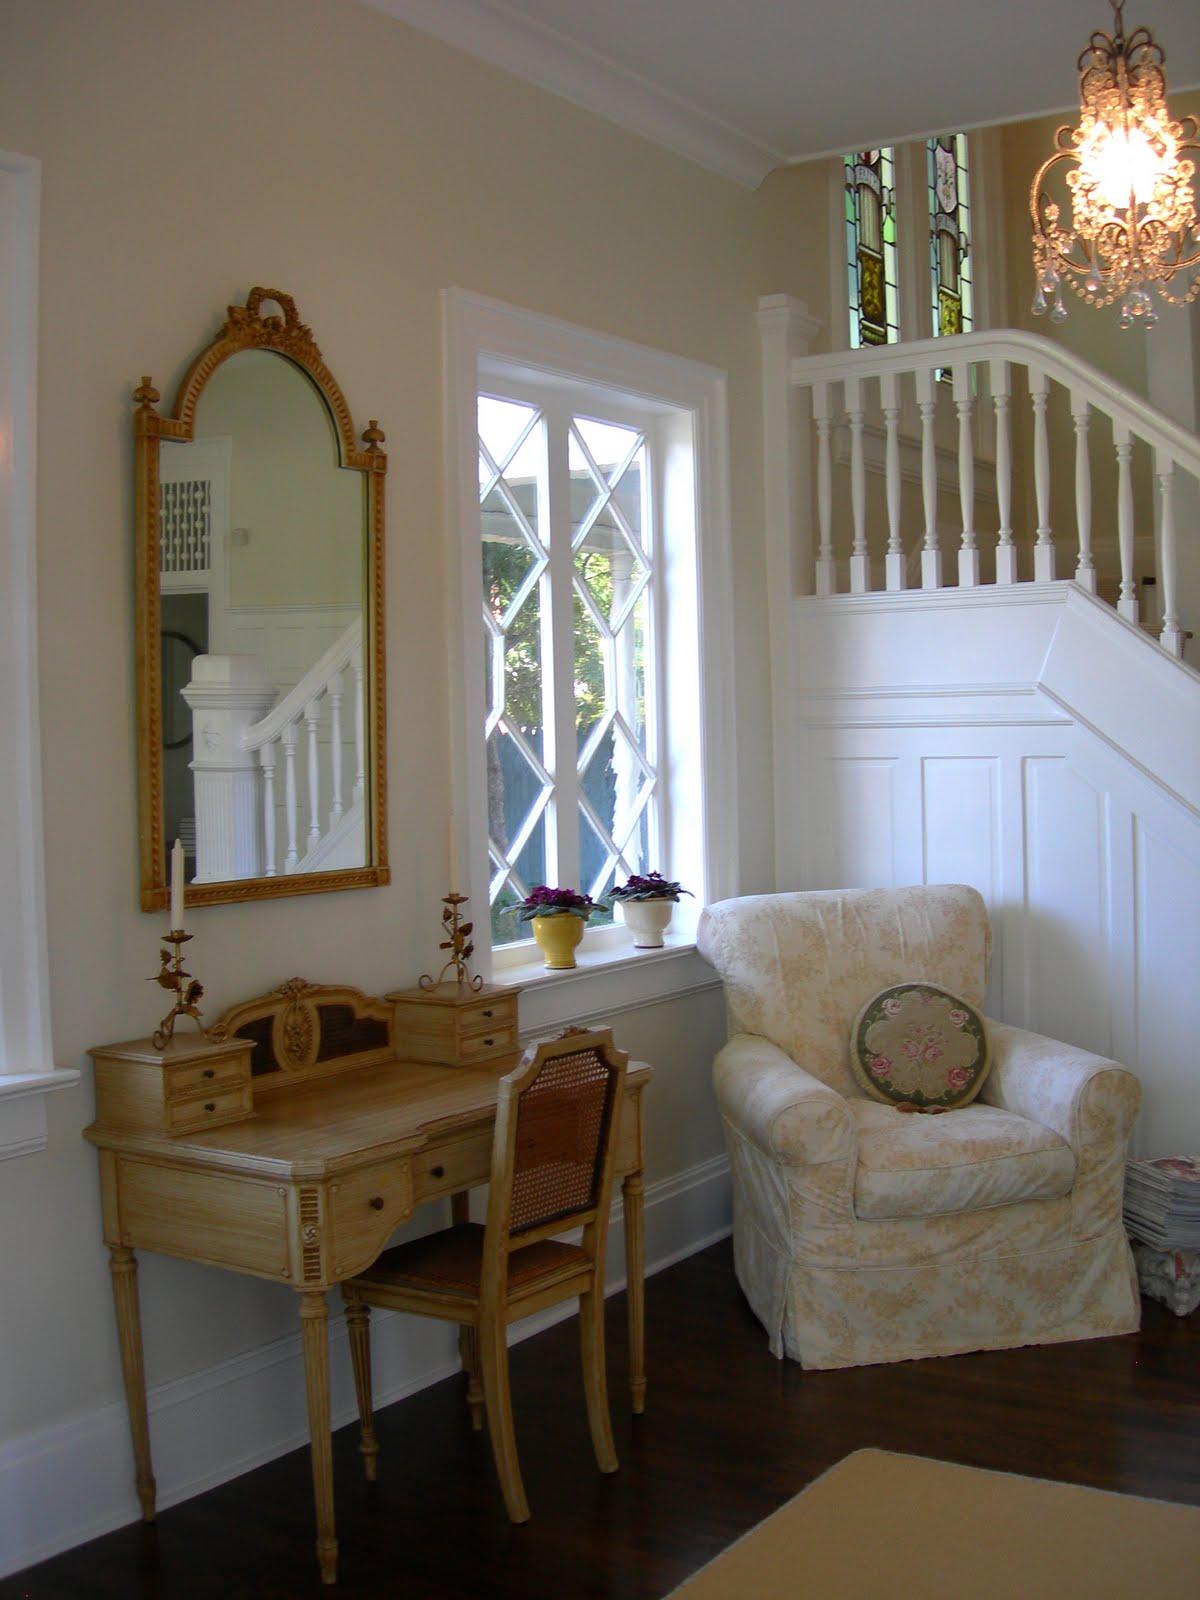 maison decor a shabby chic style maven. Black Bedroom Furniture Sets. Home Design Ideas